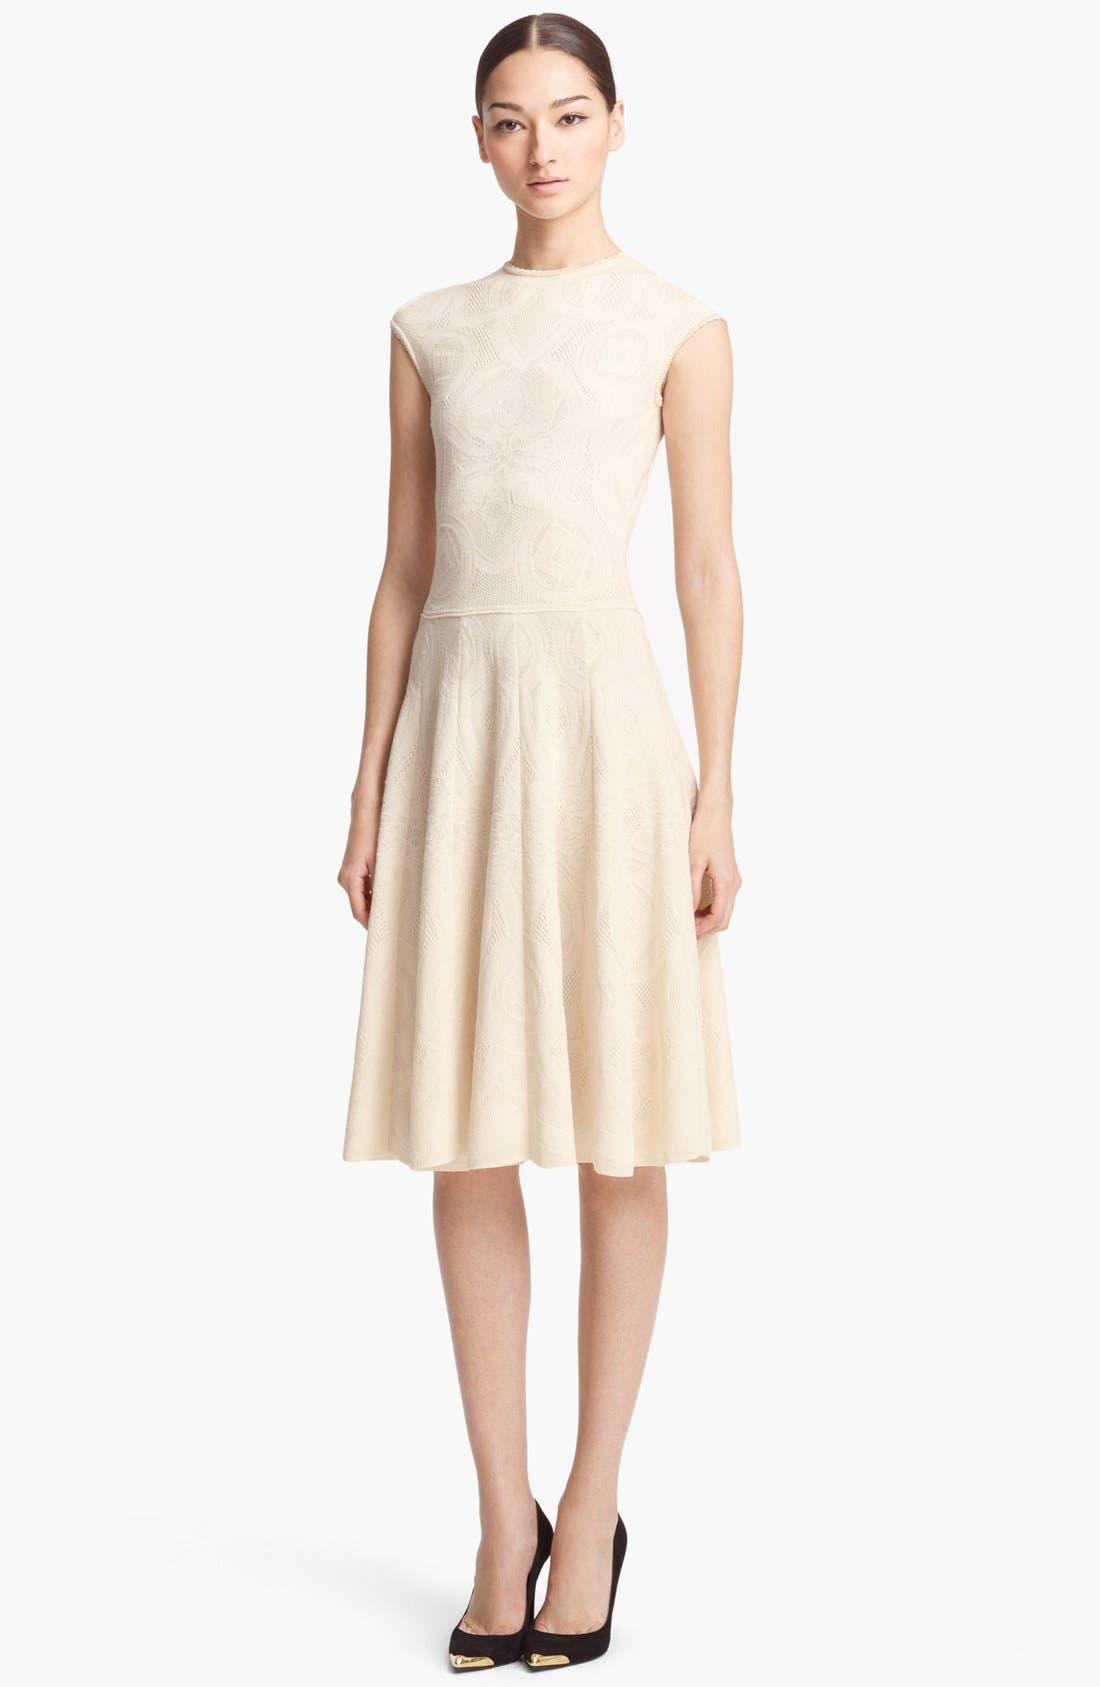 Main Image - Alexander McQueen Full Skirt Jacquard Knit Dress